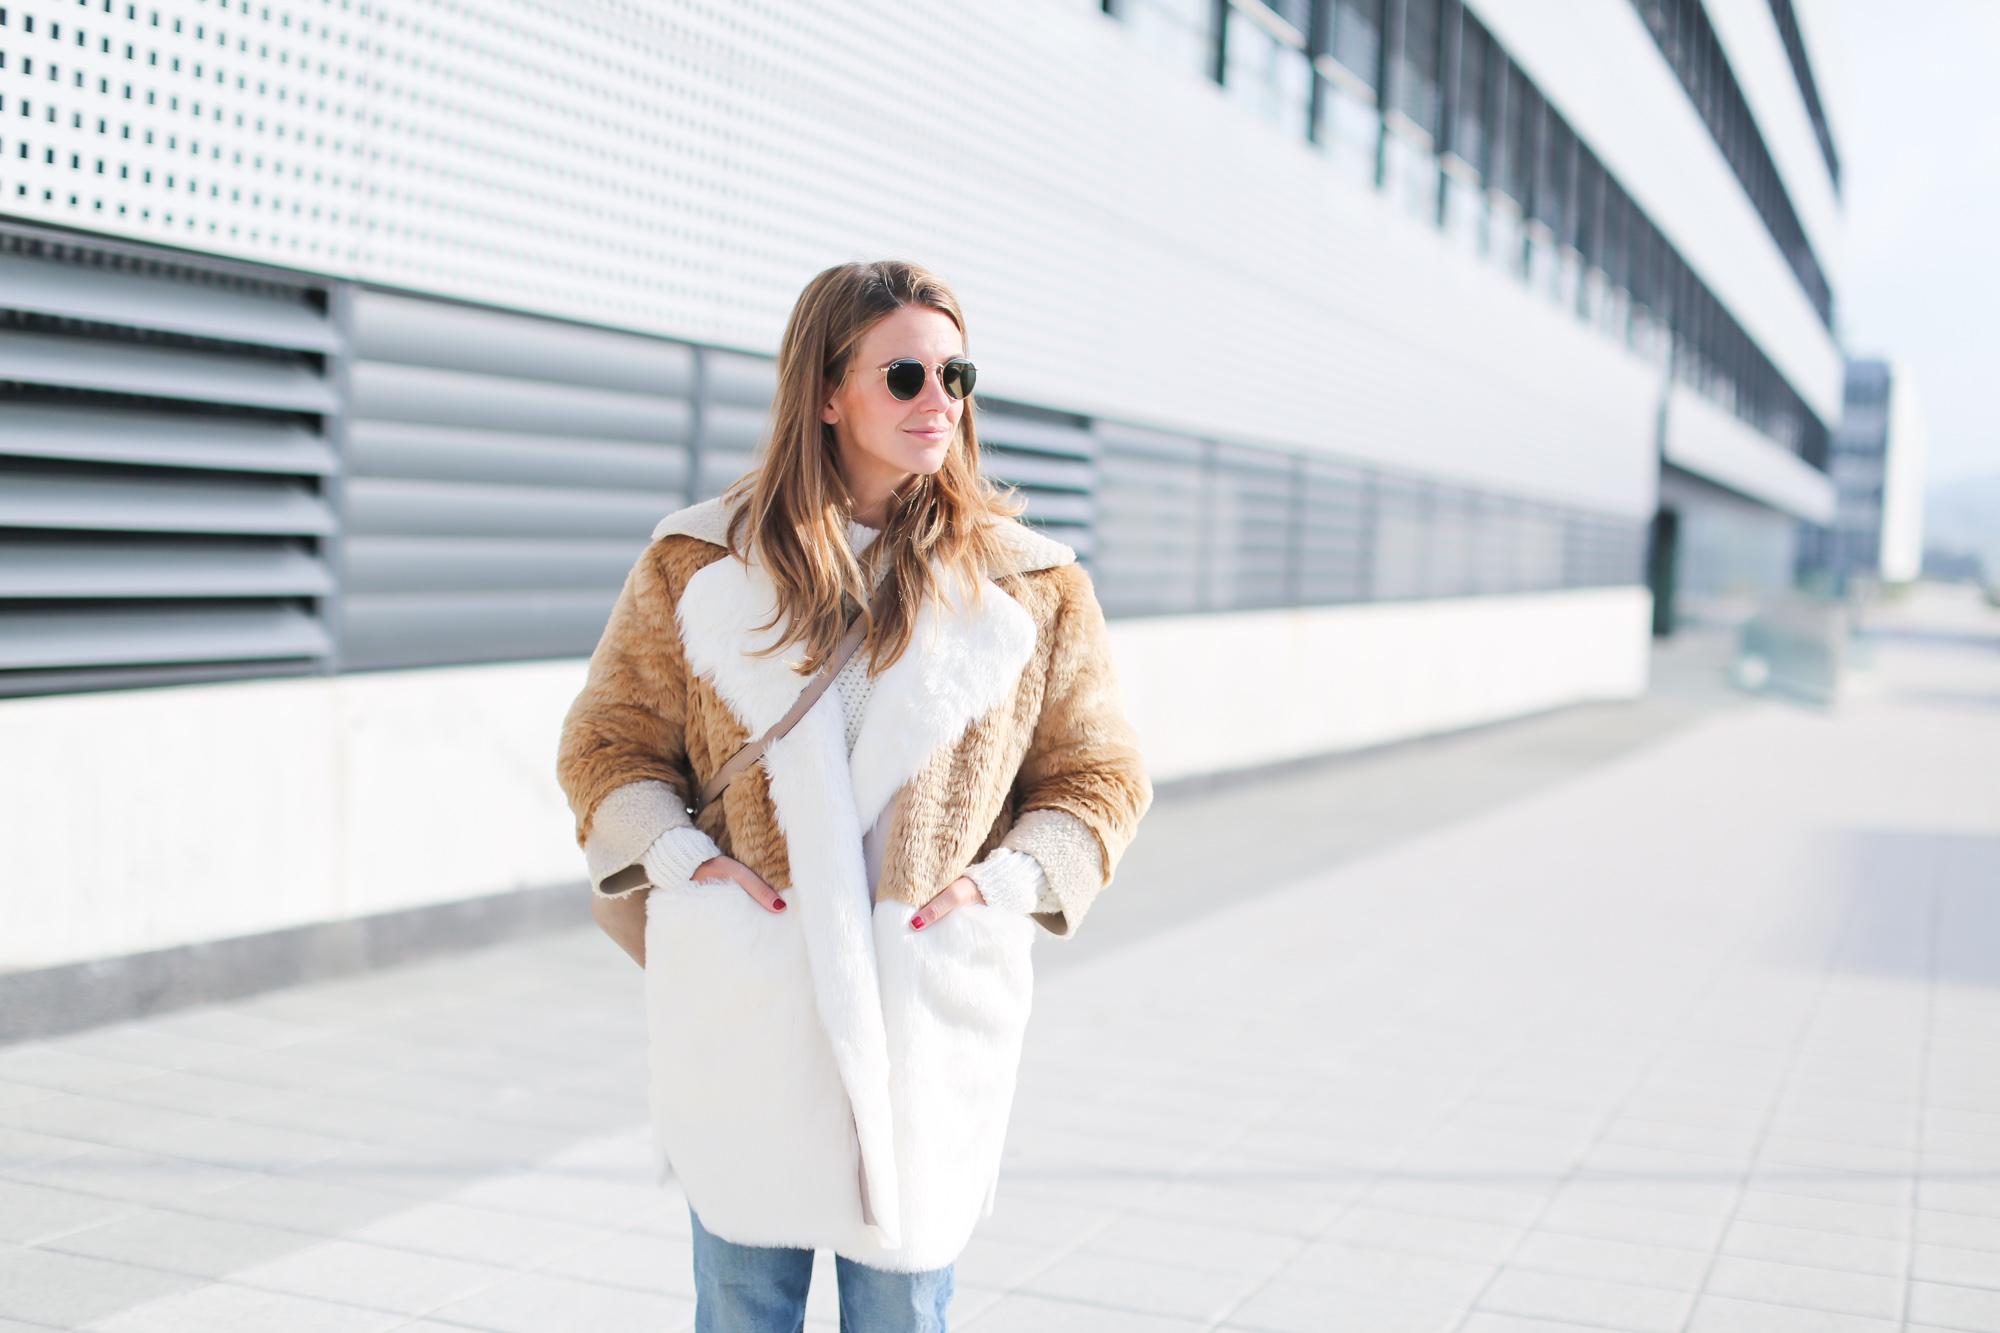 Clochet_streetstyle_fashionblogger_asosfauxfurteddycoat_pinkadidashamburg_leztinstreet_acnestudiosjeans_pop-3